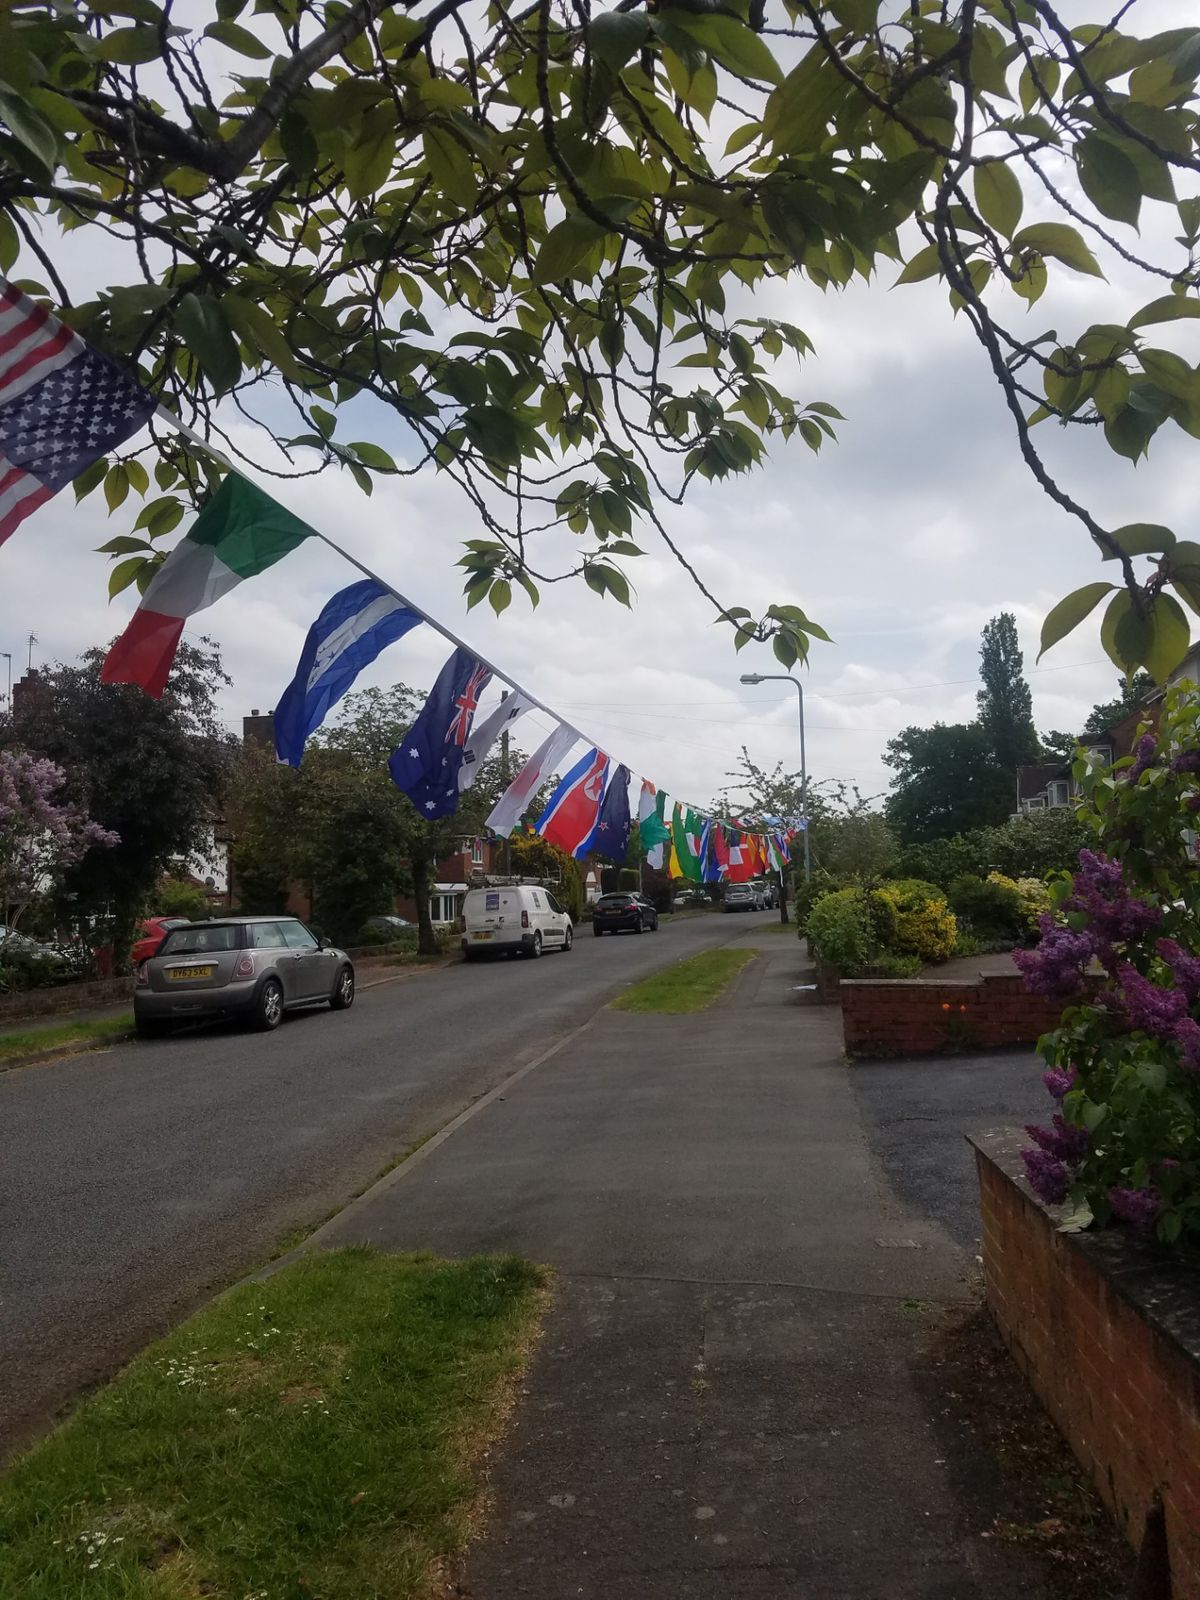 Cranford Road, Finchfield, celebrating VE Day